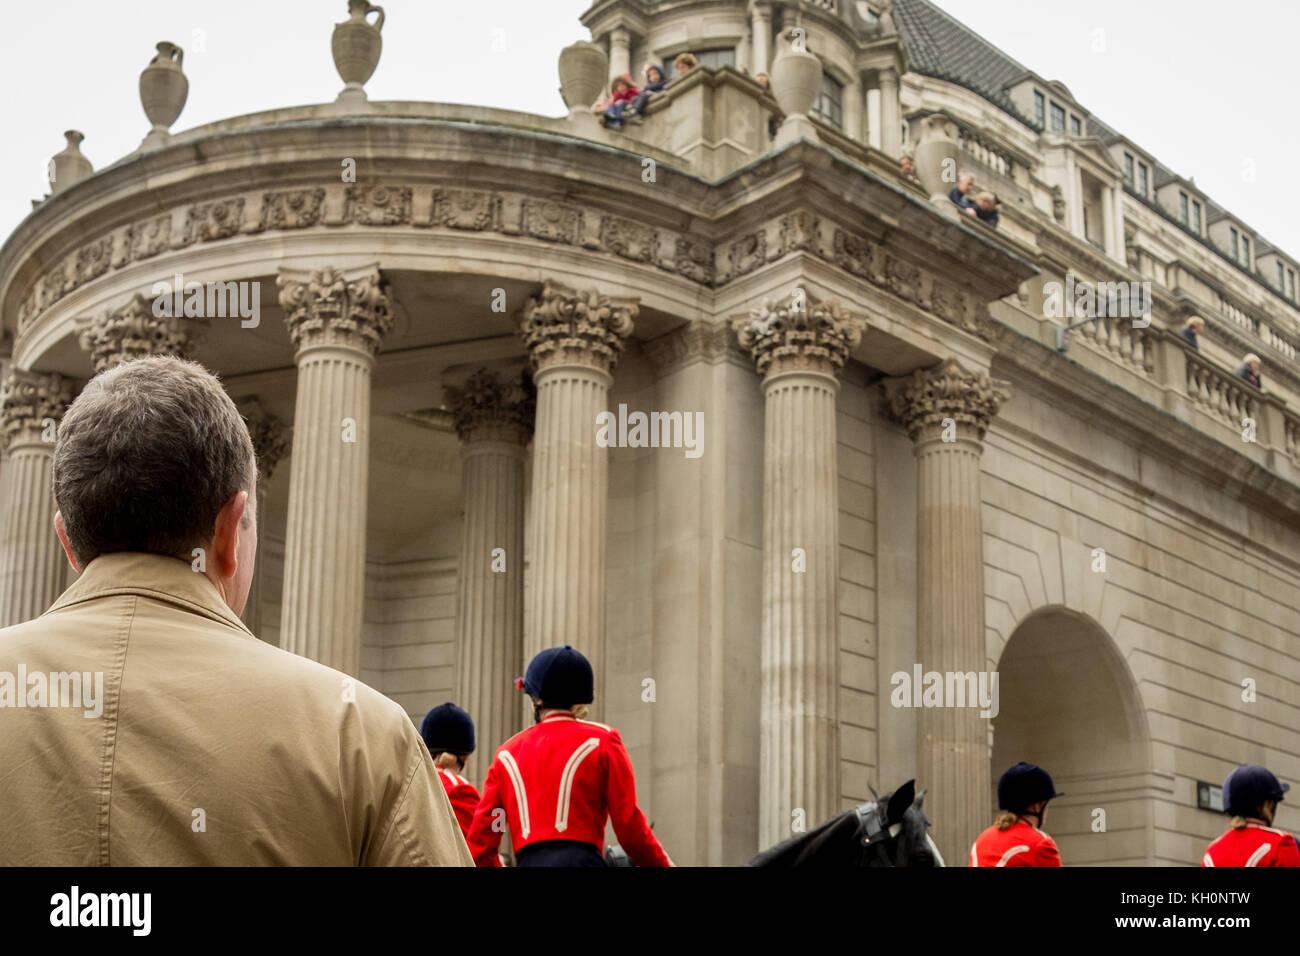 London, UK. 11th Nov, 2017. The Lord Mayor's Show through the City of London as the New Lord Mayor of London Charles - Stock Image